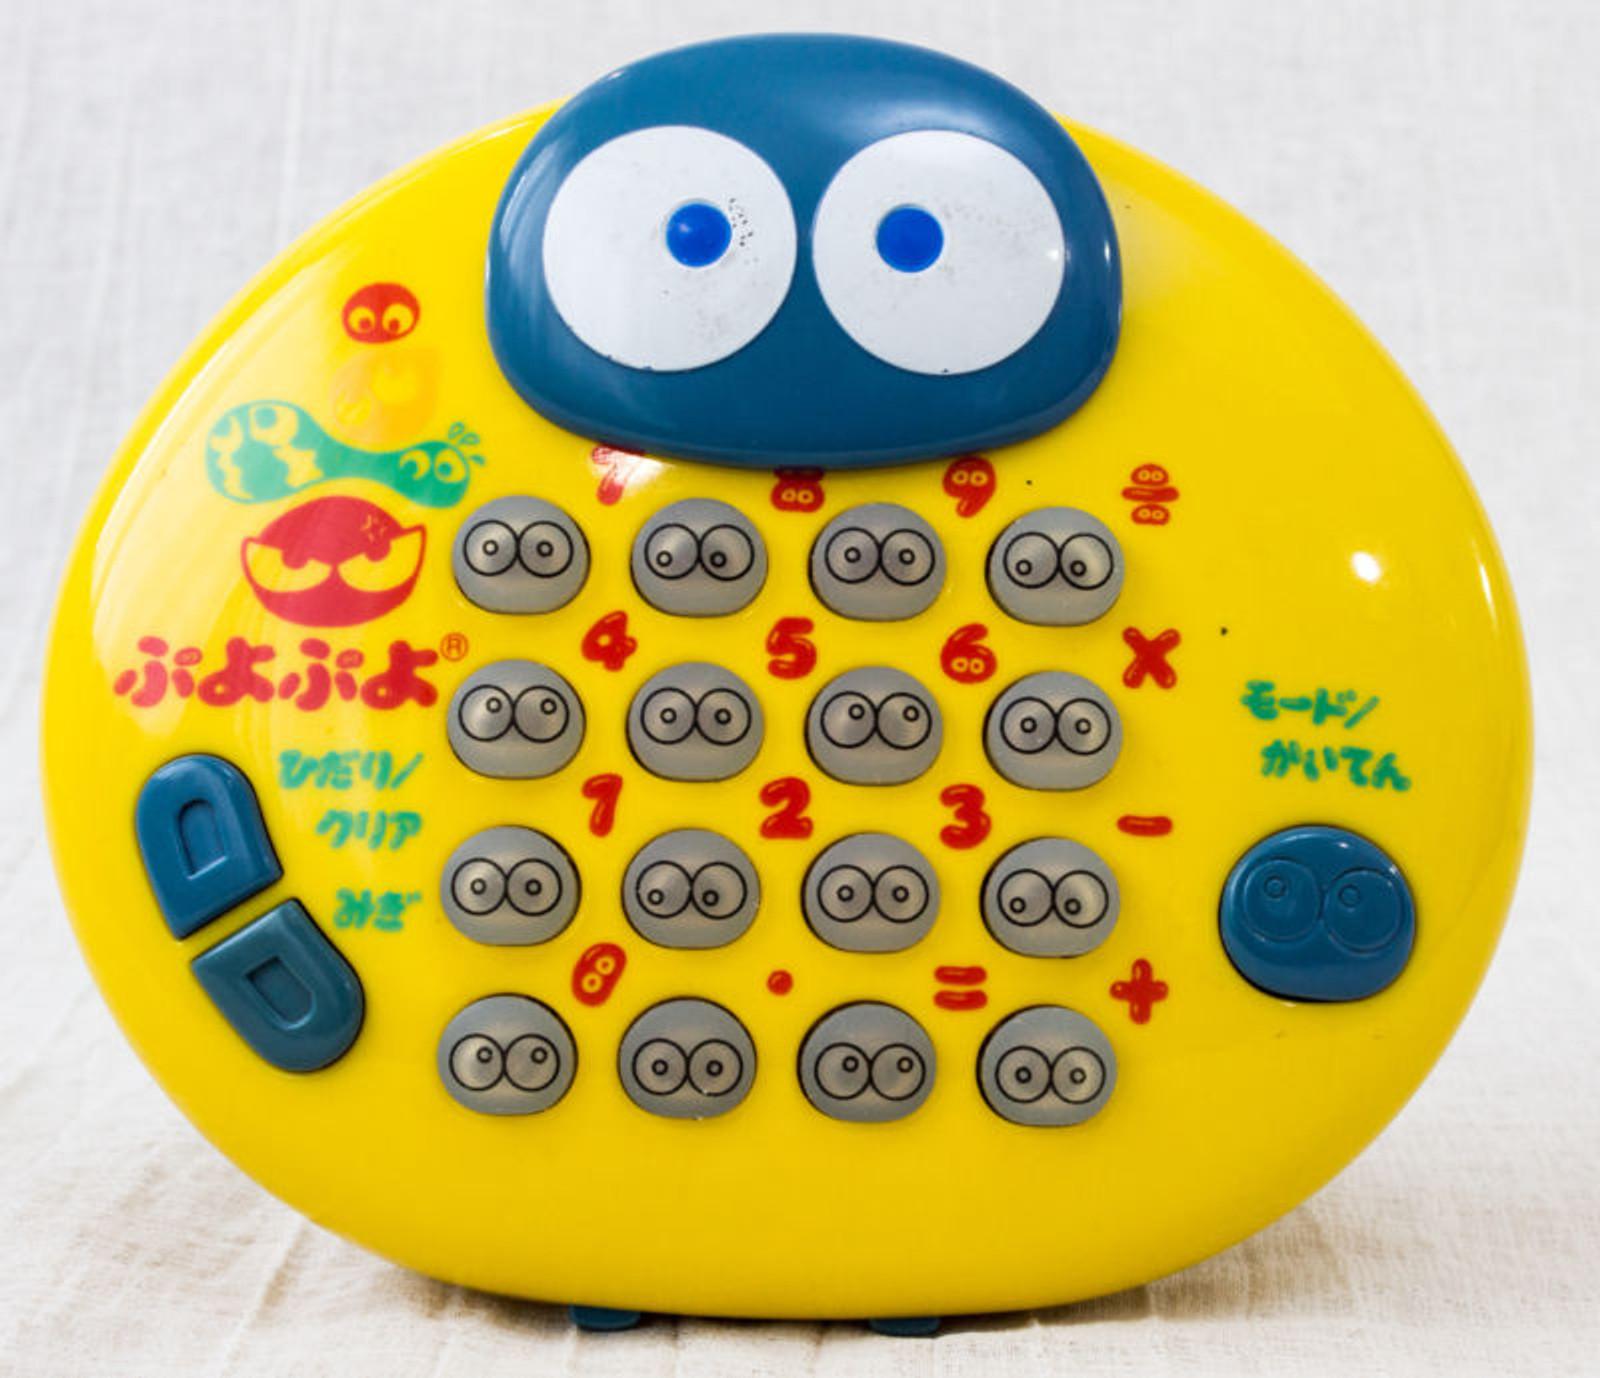 RARE! PUYO PUYO Calculator & Game Machine Toy Bandai 1995 JAPAN GAME ANIME